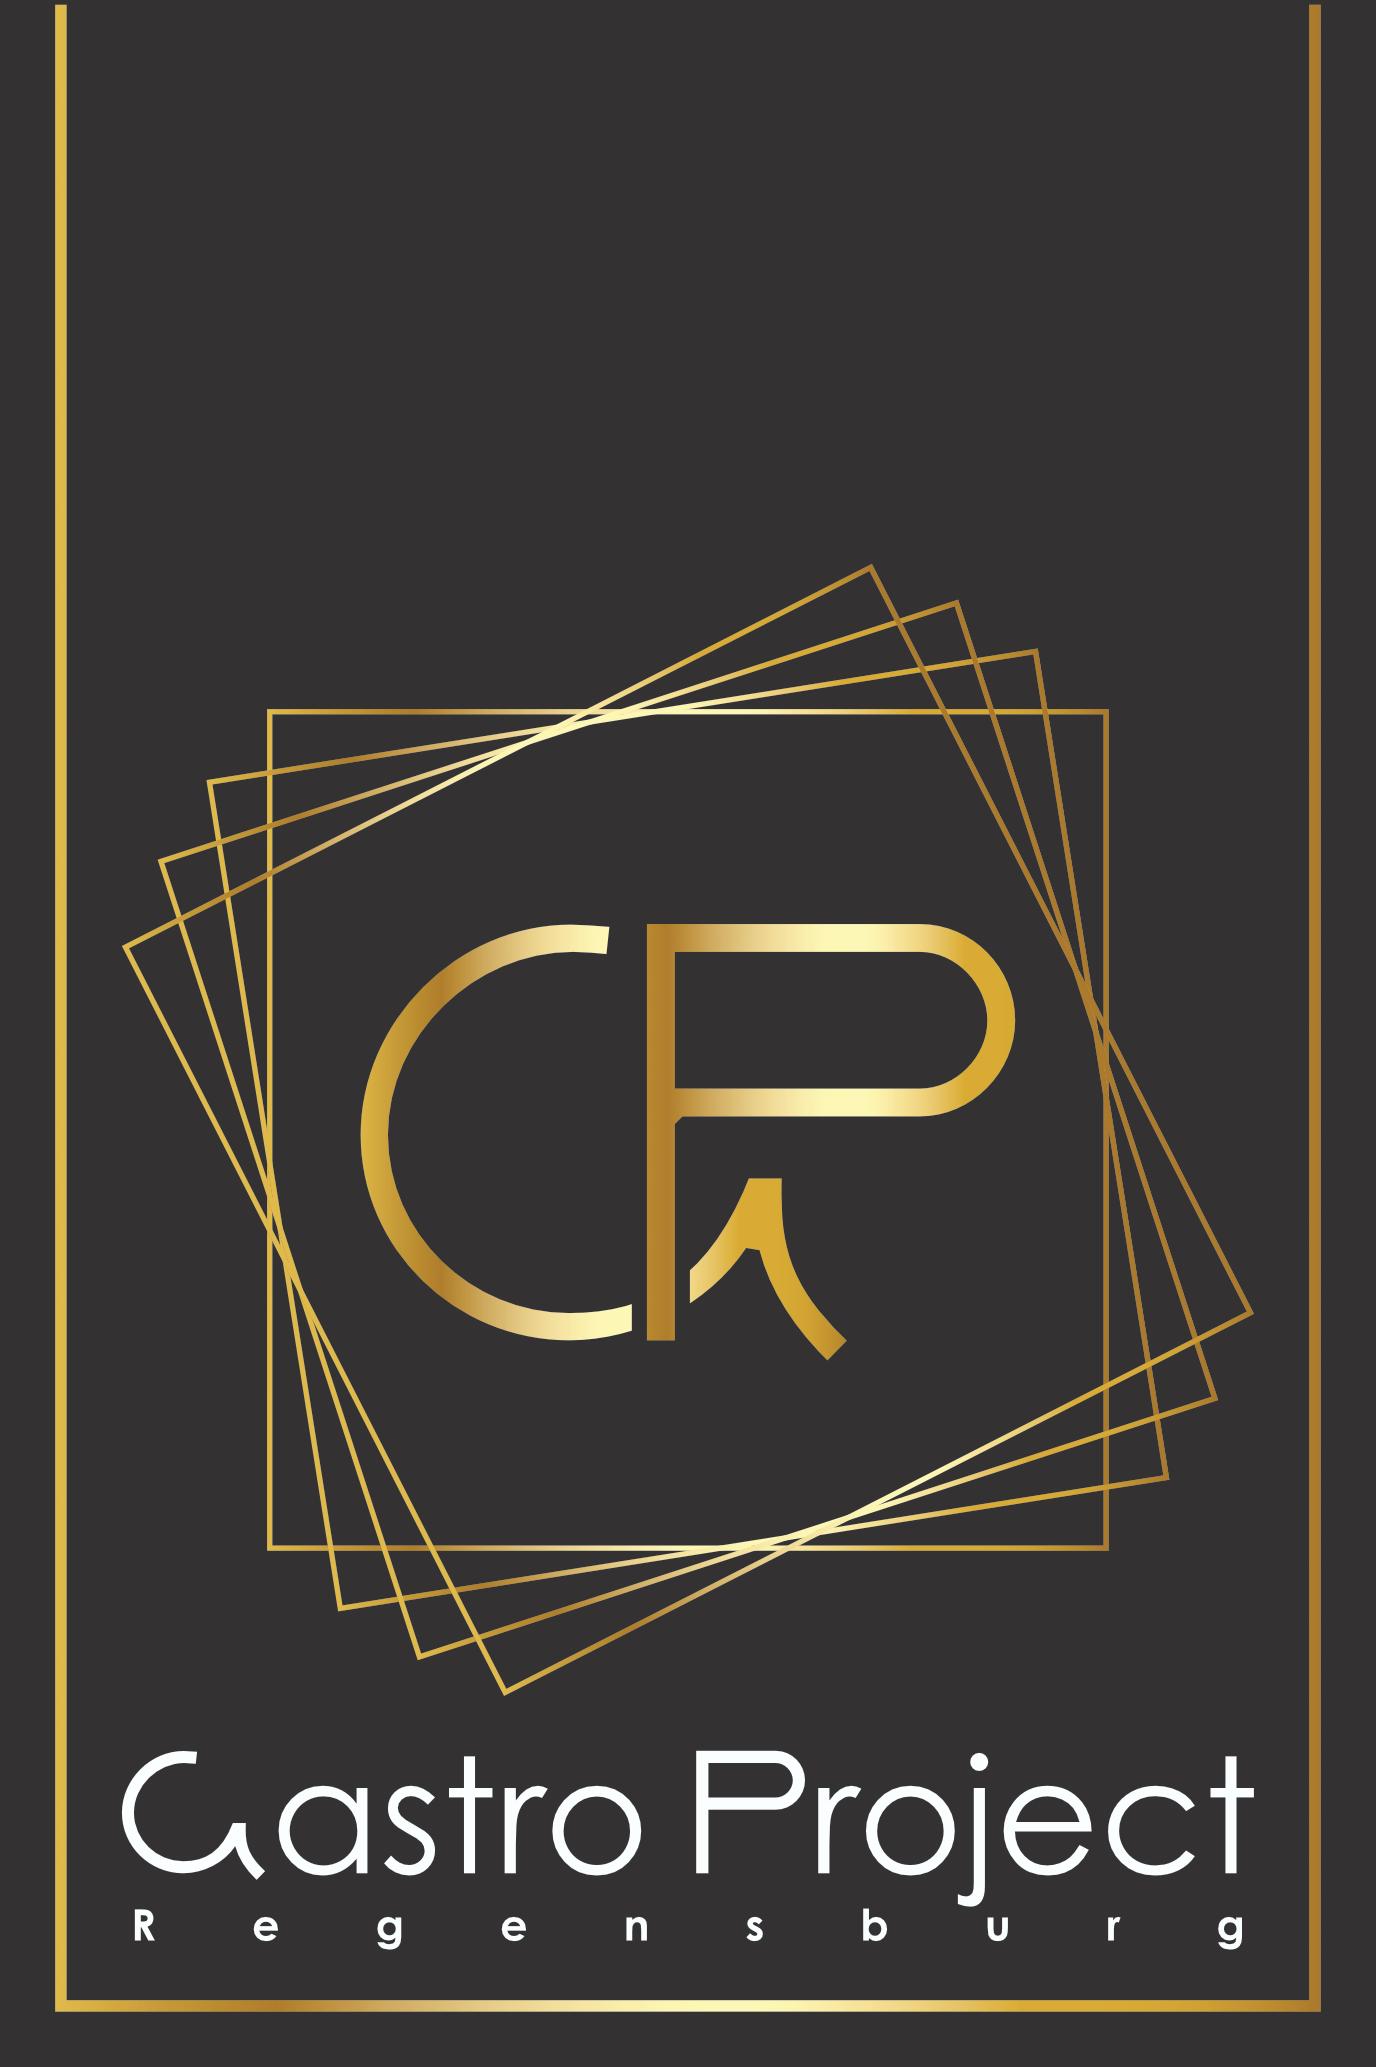 Logo Gastro-Project Regensburg